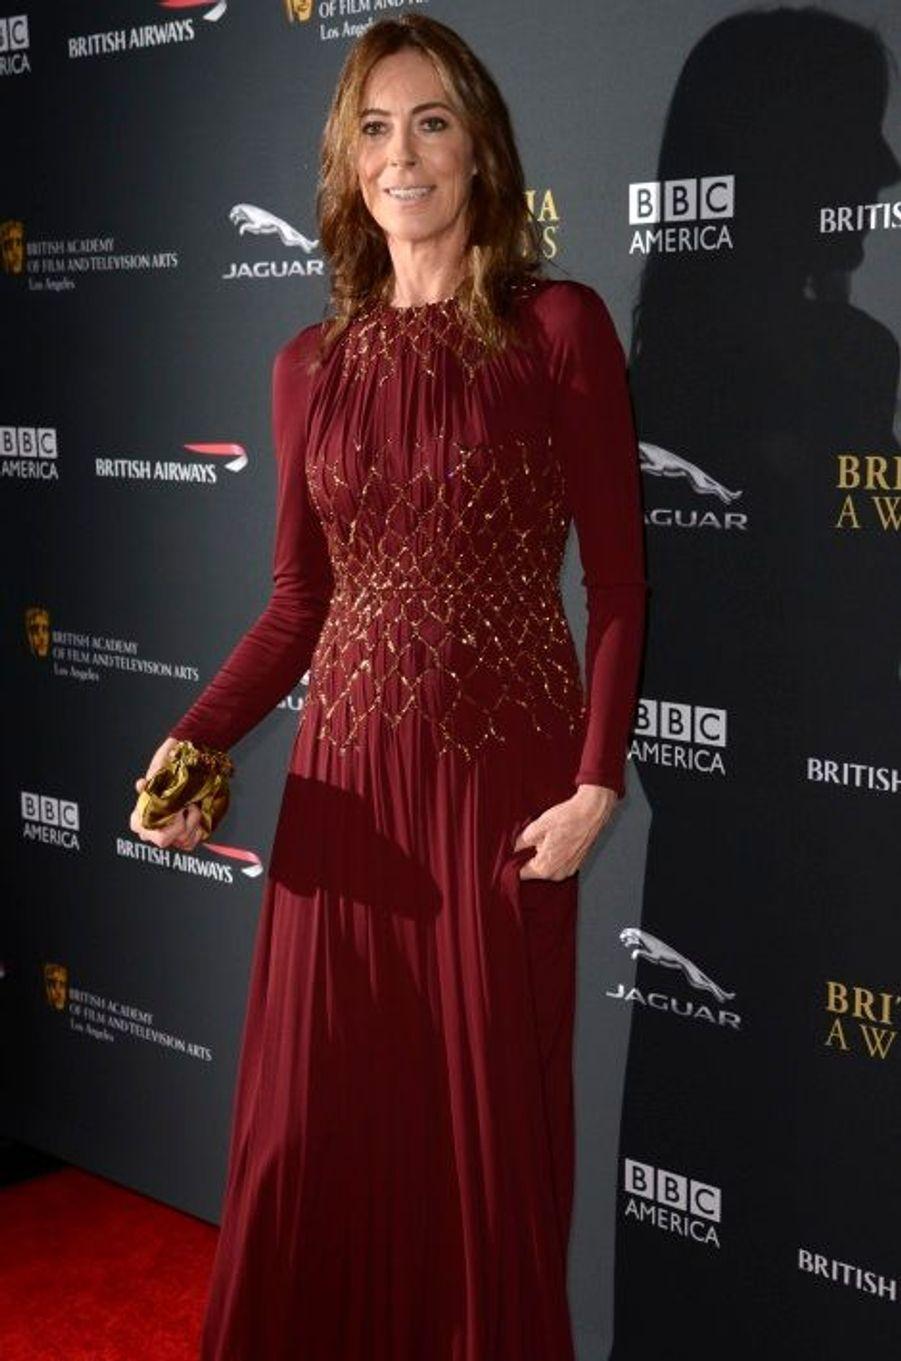 Kathryn Bigelow, honorée du John Schlesinger Britannia Award for Excellence in Directing